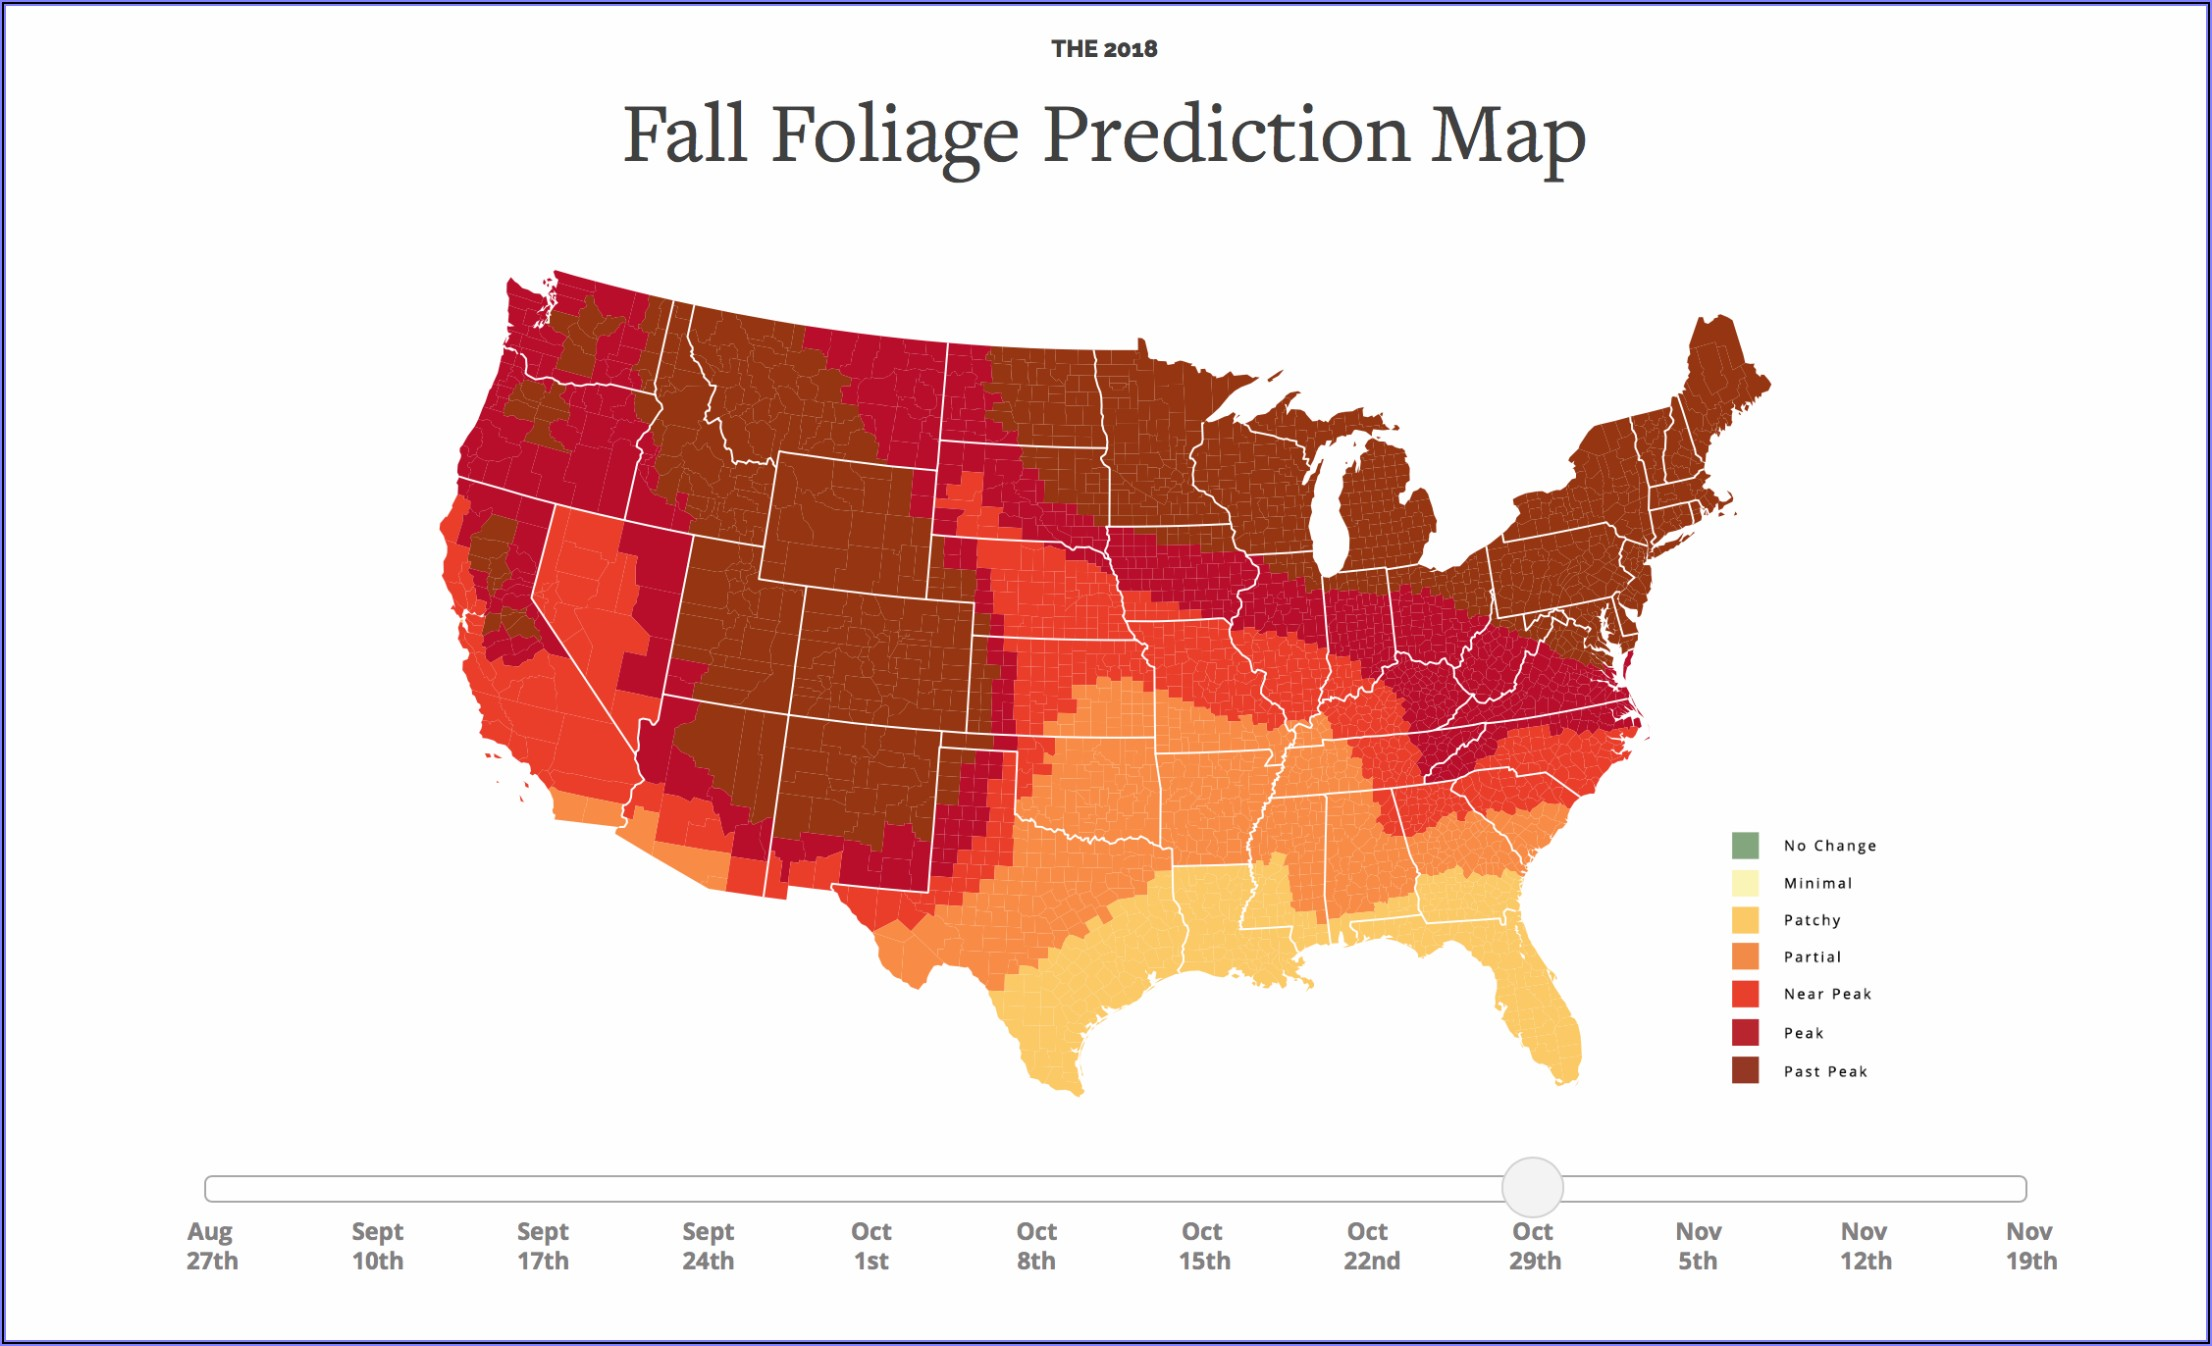 Fall Foliage Prediction Map 2018